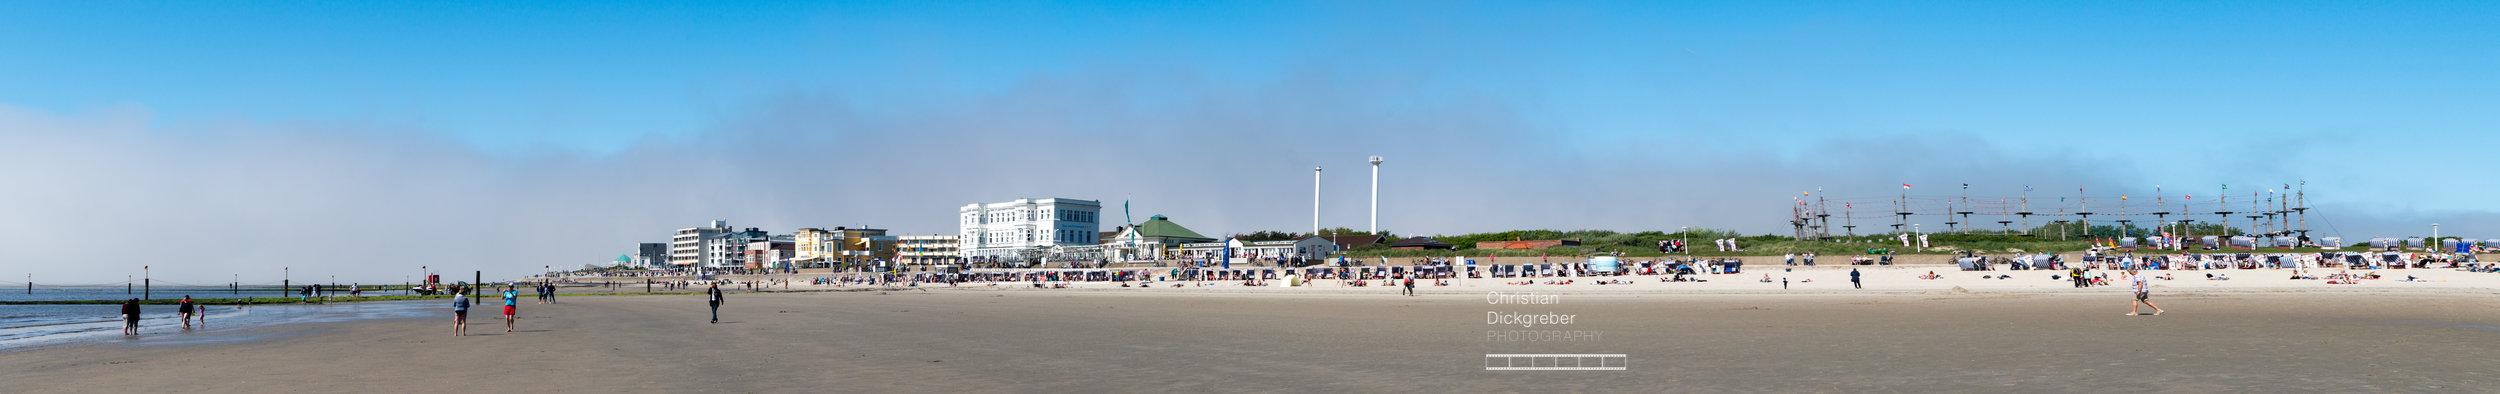 Norderney - Western Beach